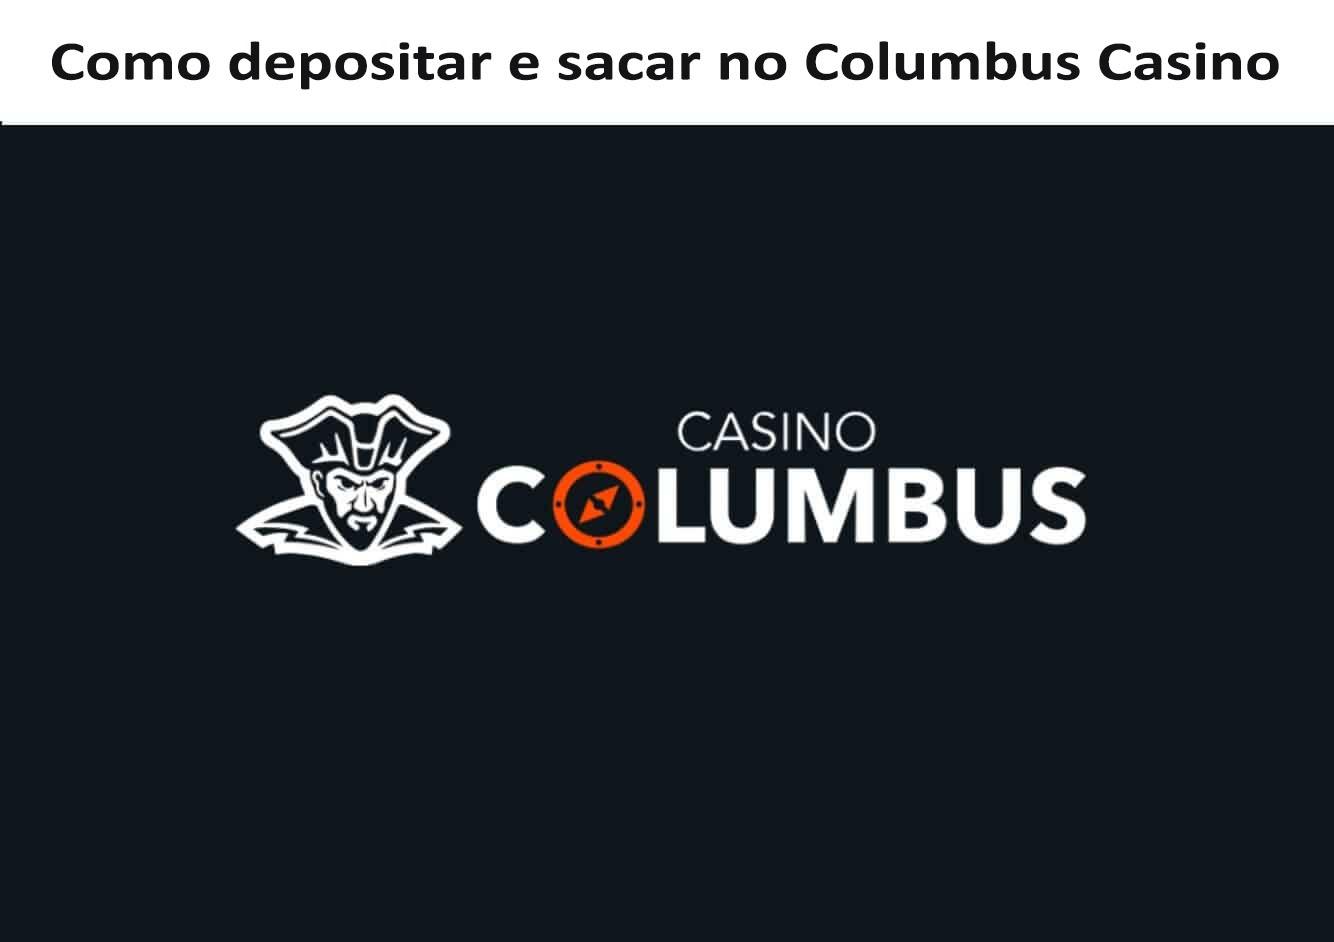 Columbus Casino Depósito e Saque